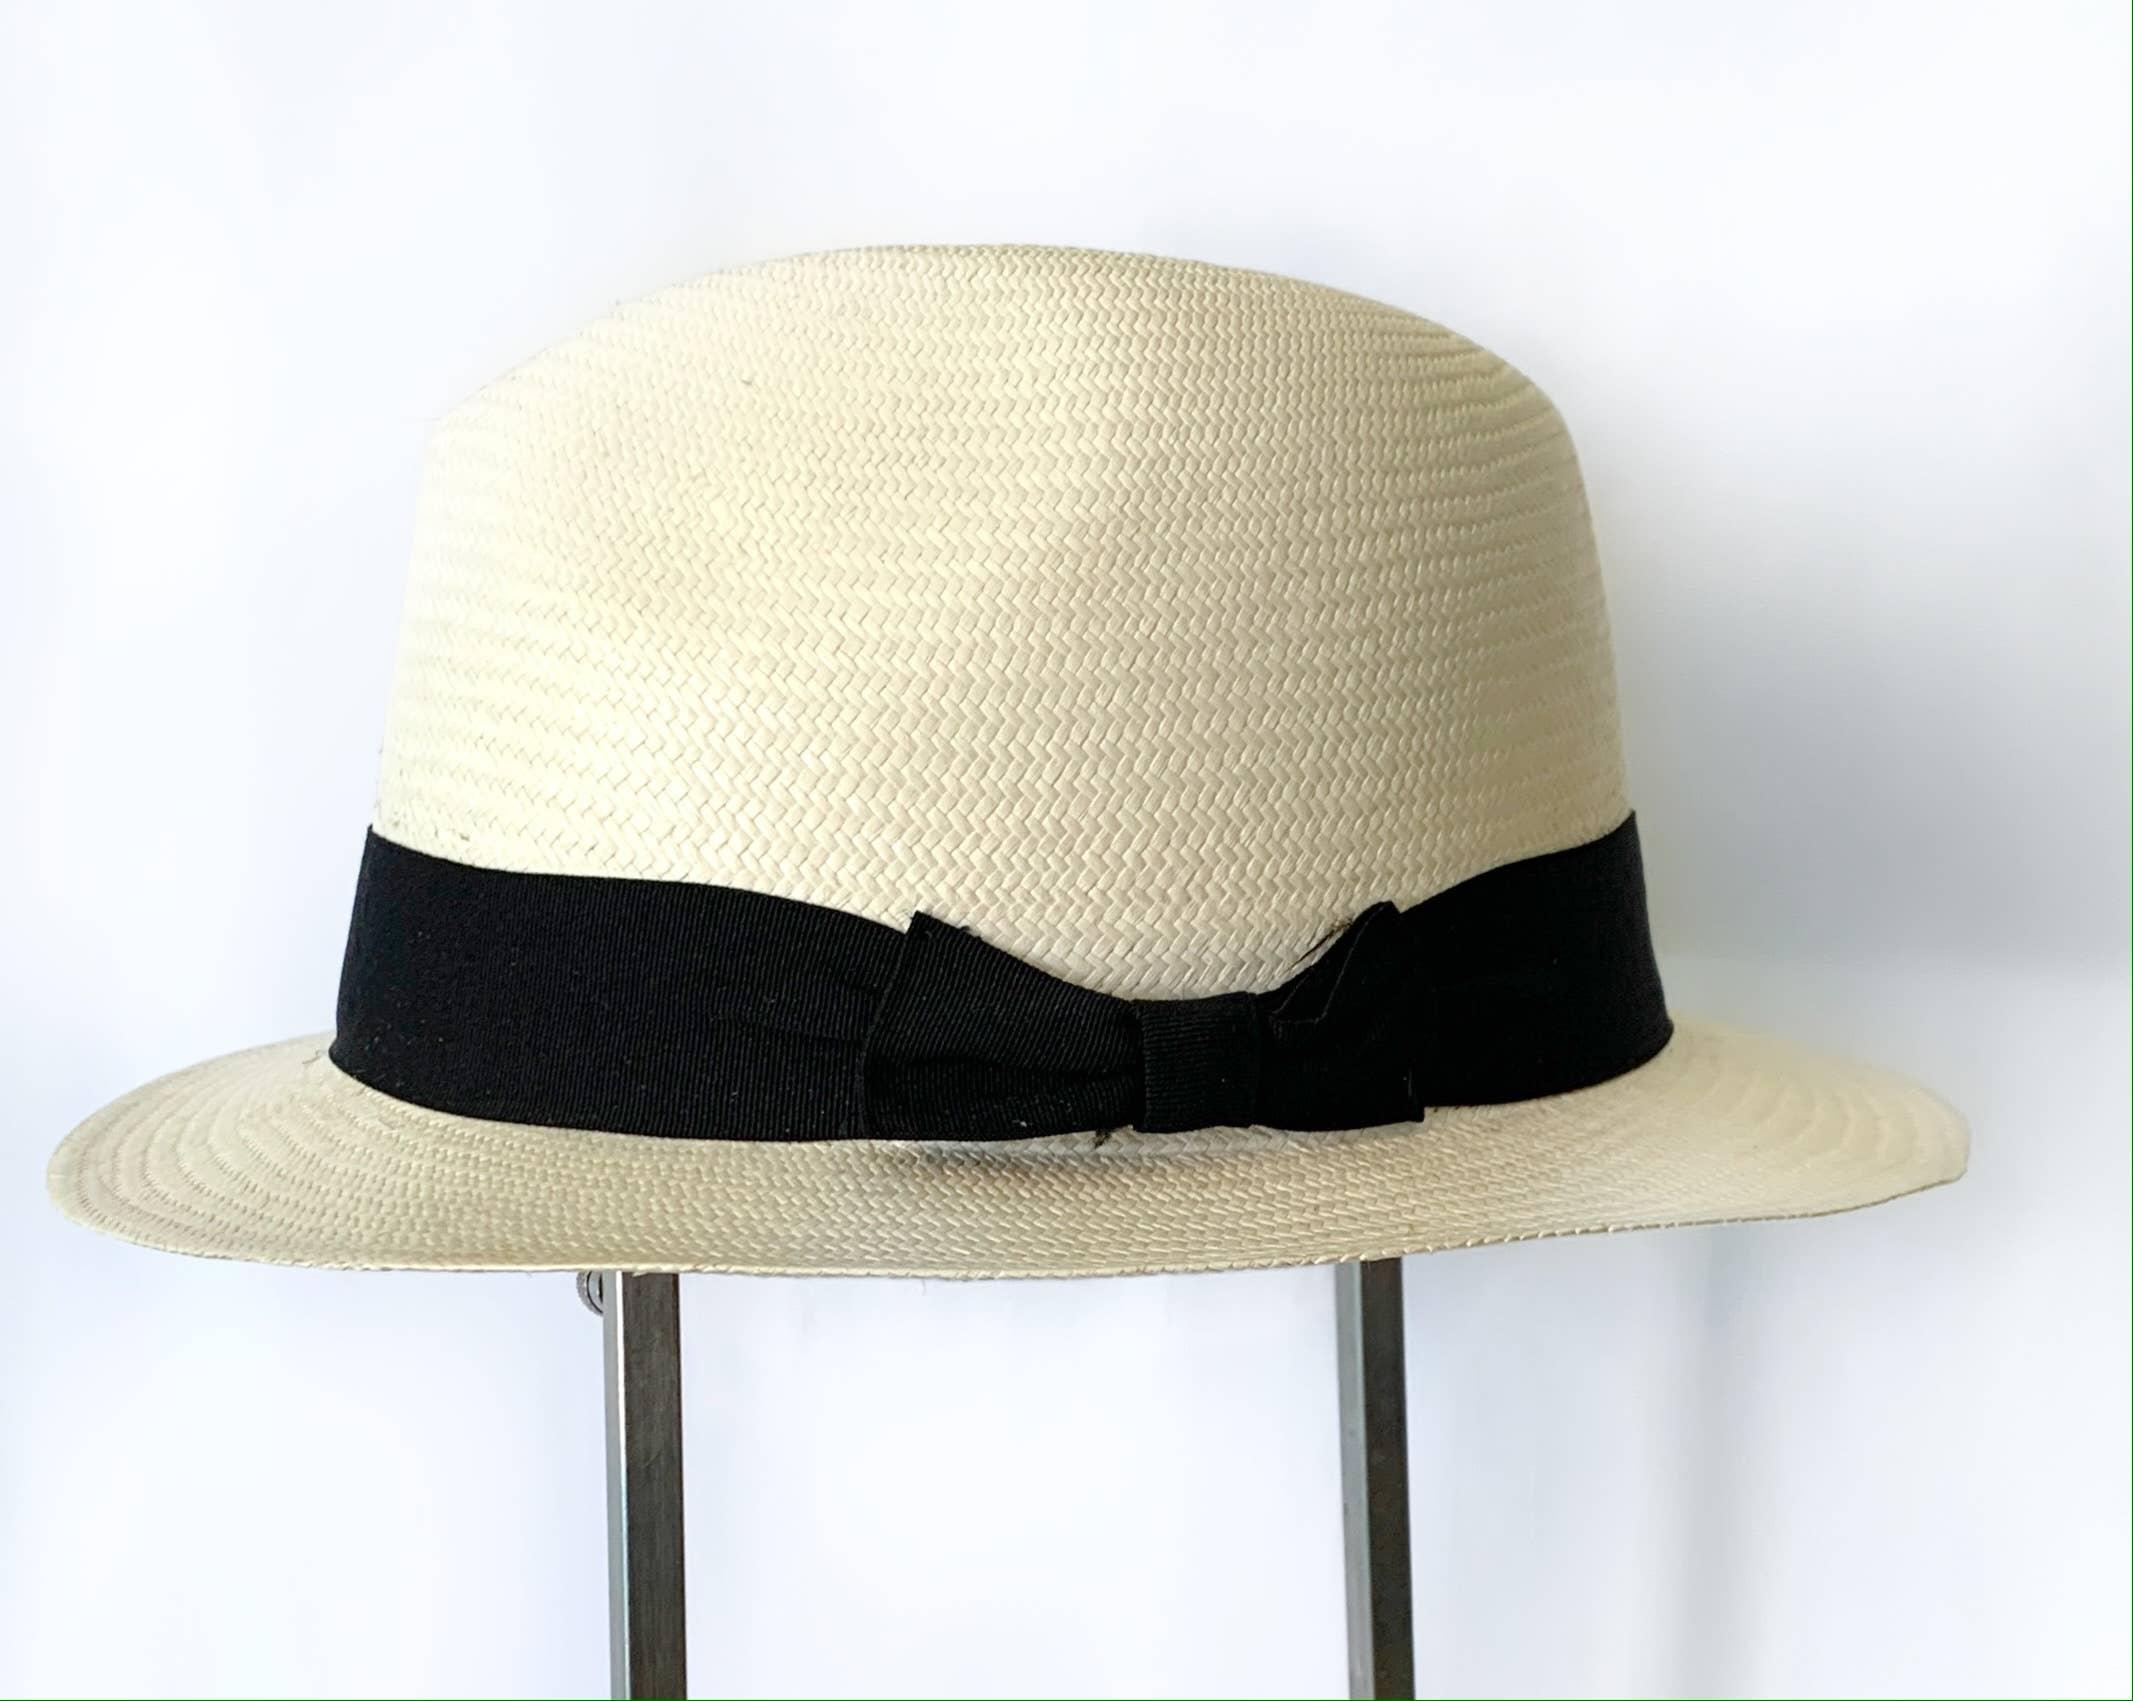 Lemloreli - Classic Fedora Hat | Trada Marketplace